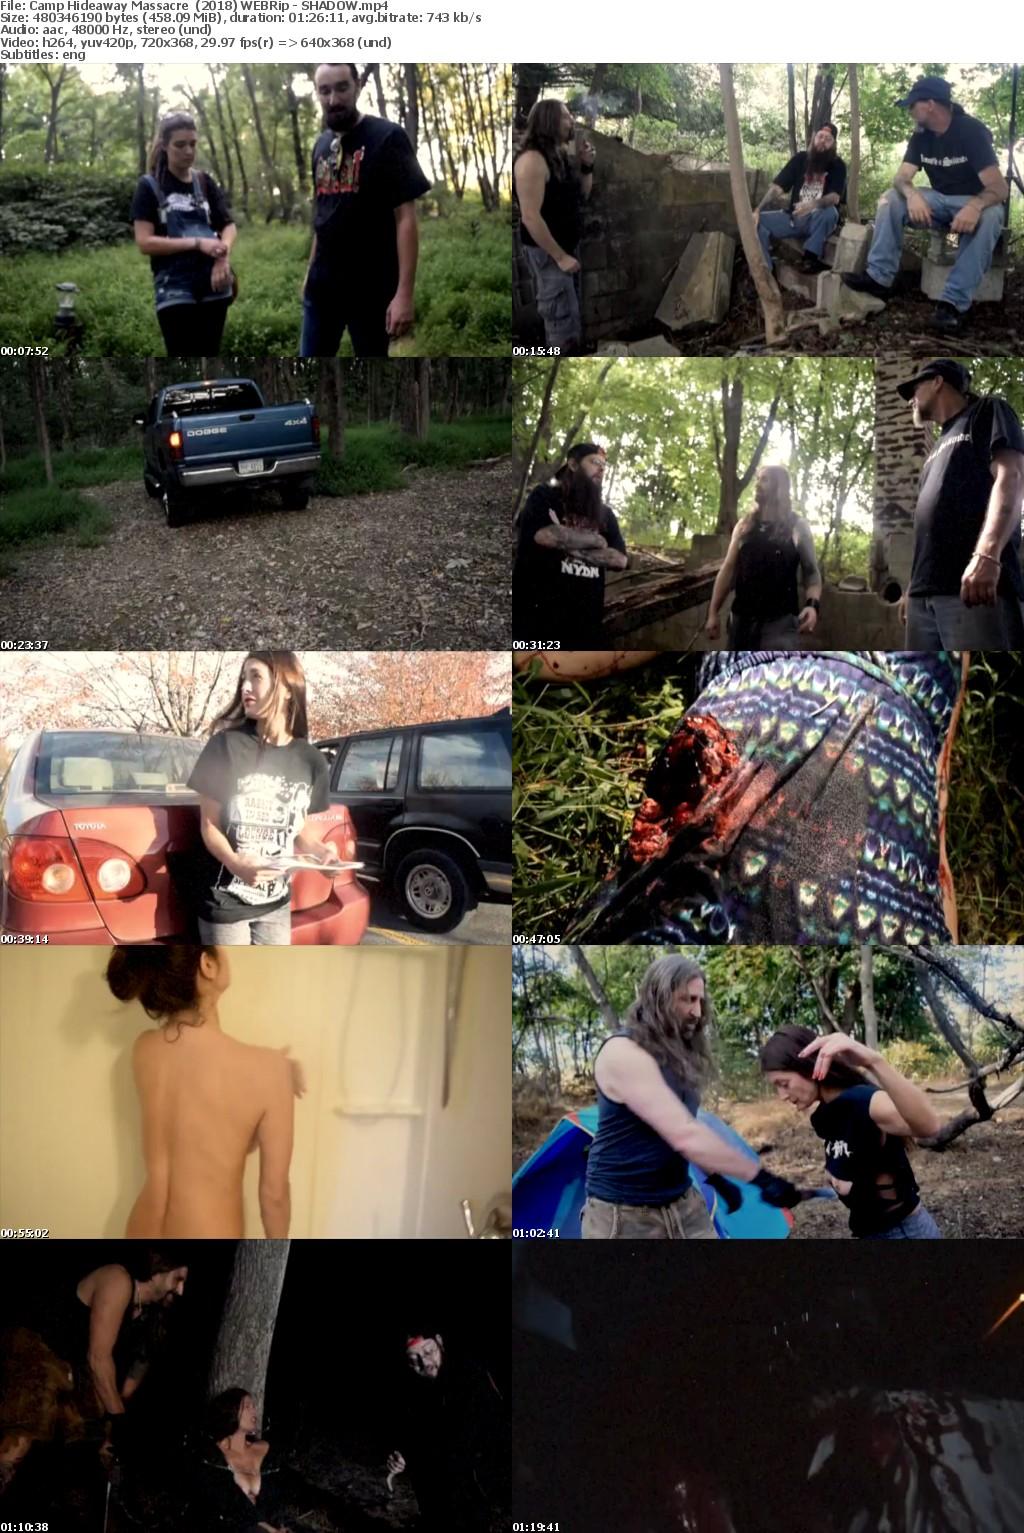 Camp Hideaway Massacre (2018) WEBRip - SHADOW